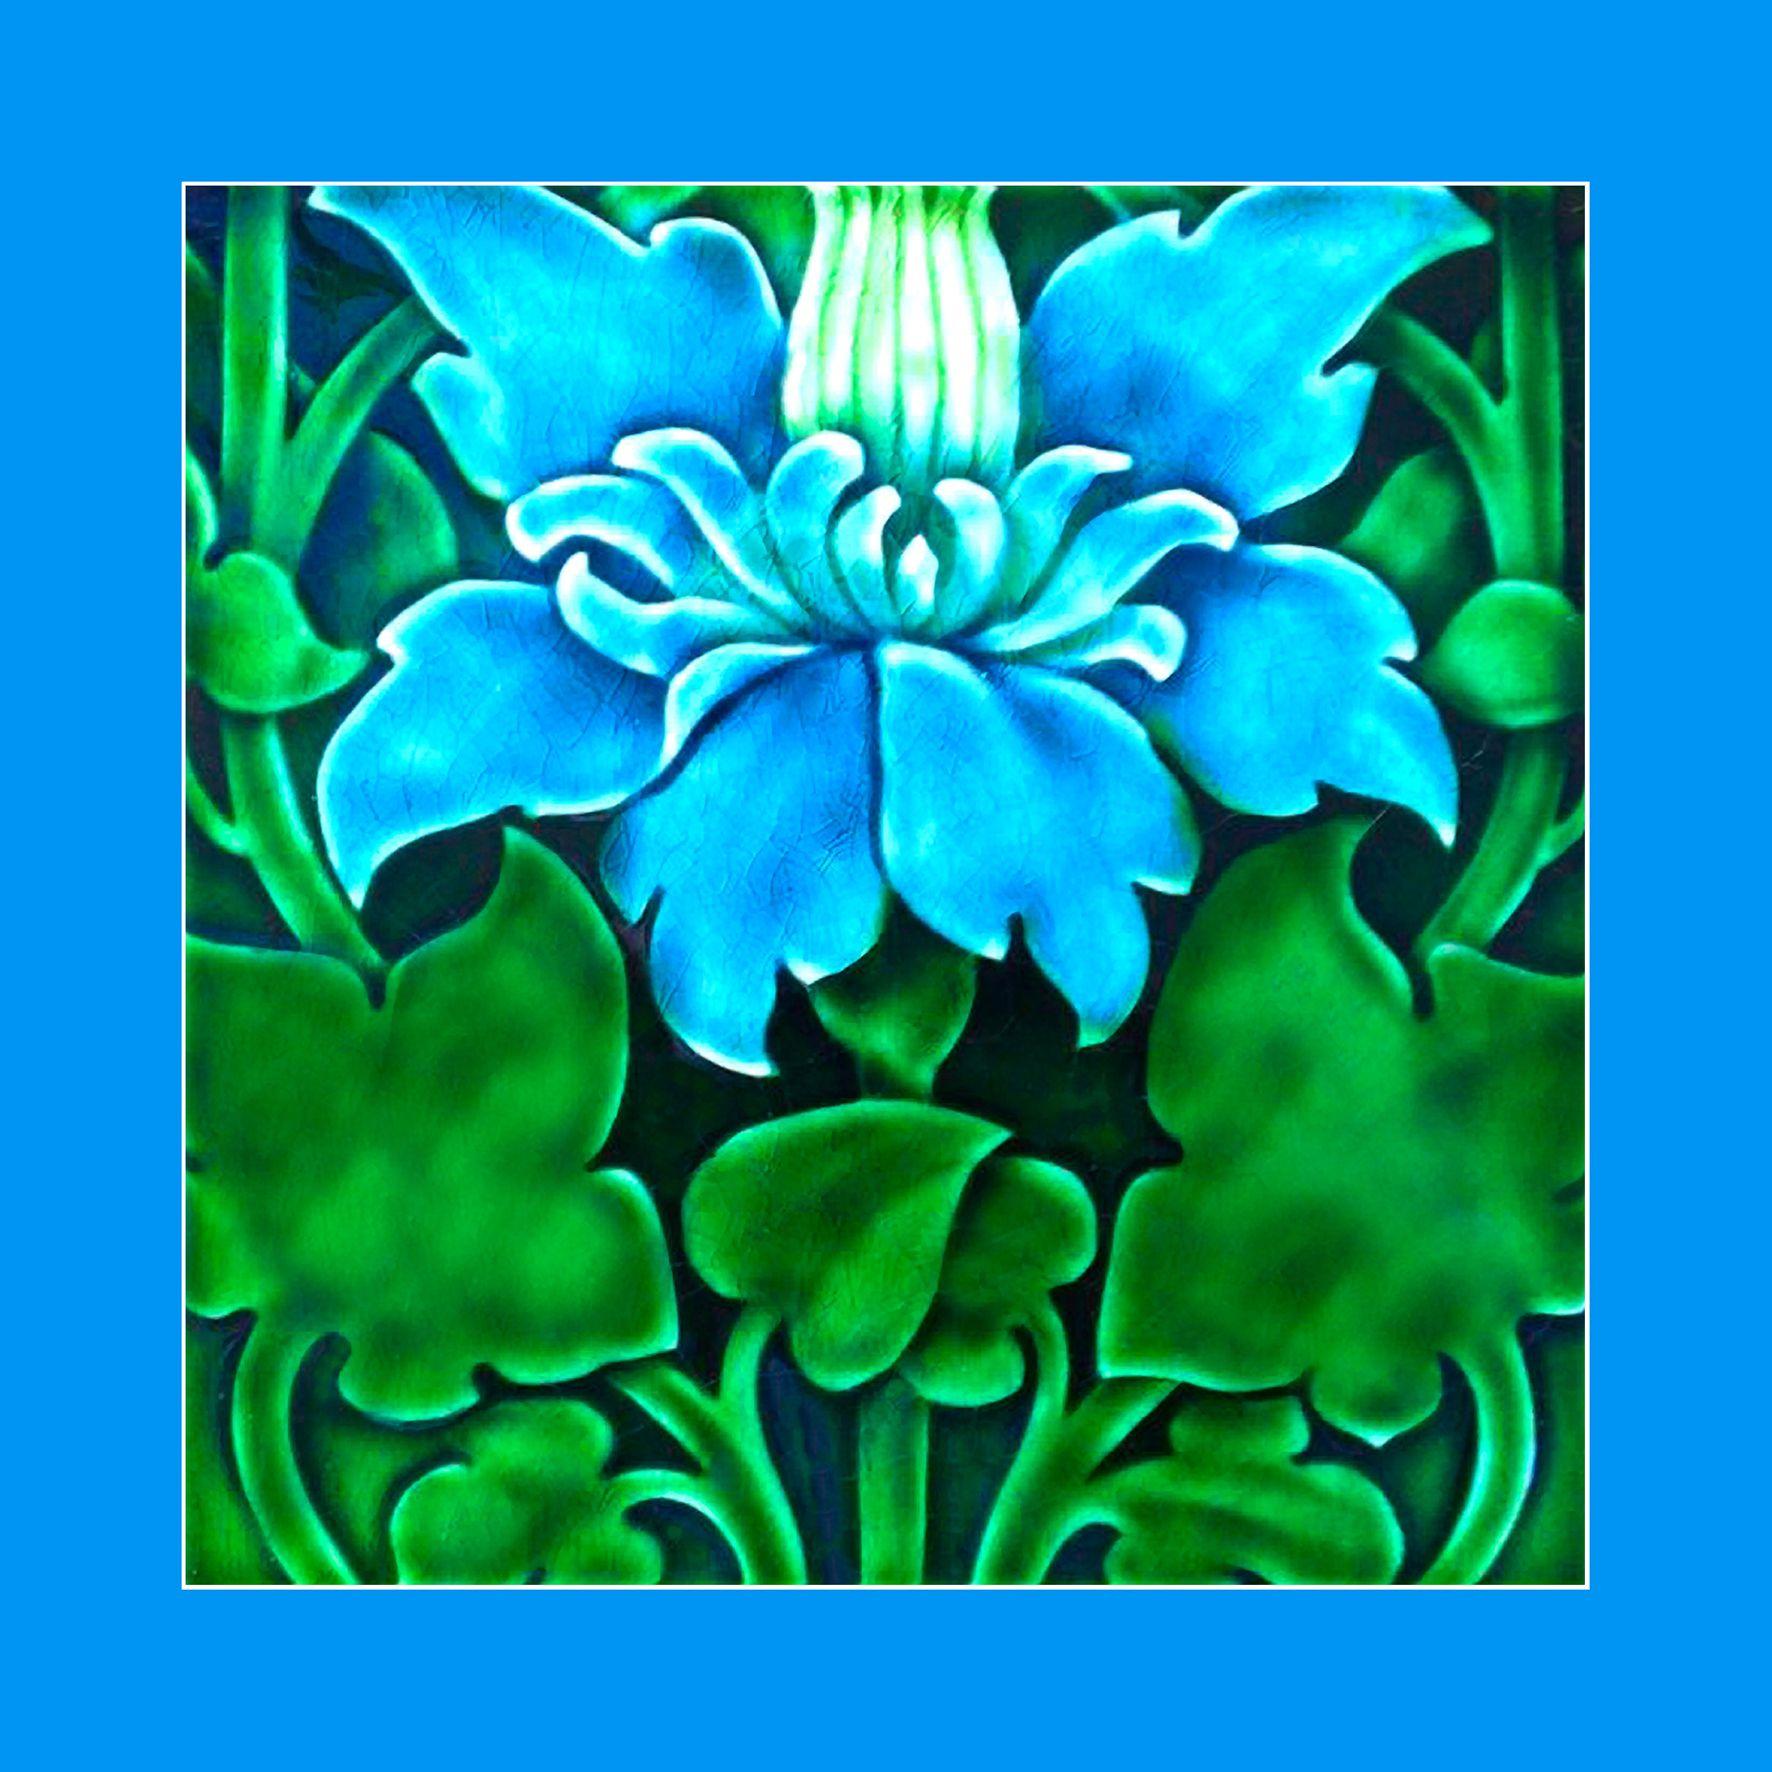 109 Art Nouveau Tile By Pilkington 1905 Courtesy Of Robert Smith From His Book Art Nouveau Tiles With Style Buy Art Nouveau Tiles Tile Art Art Deco Tiles